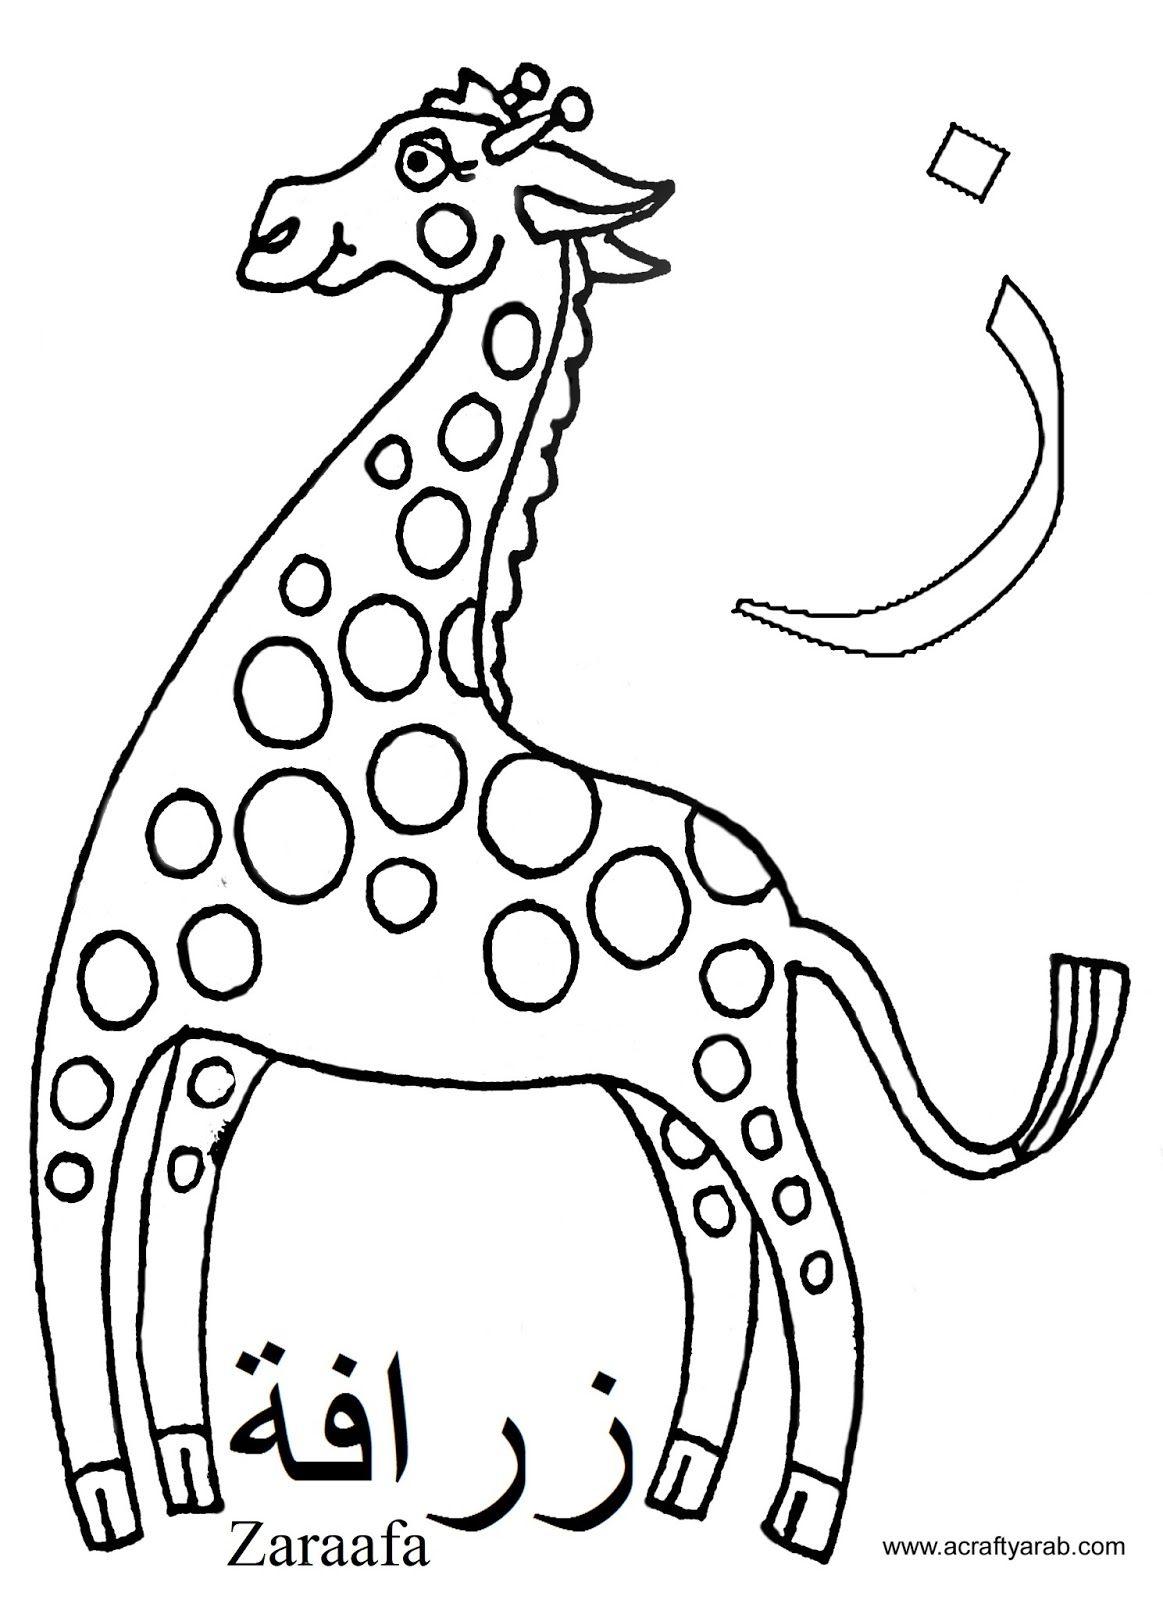 A Crafty Arab: Arabic Alphabet coloring pages...Zayn is